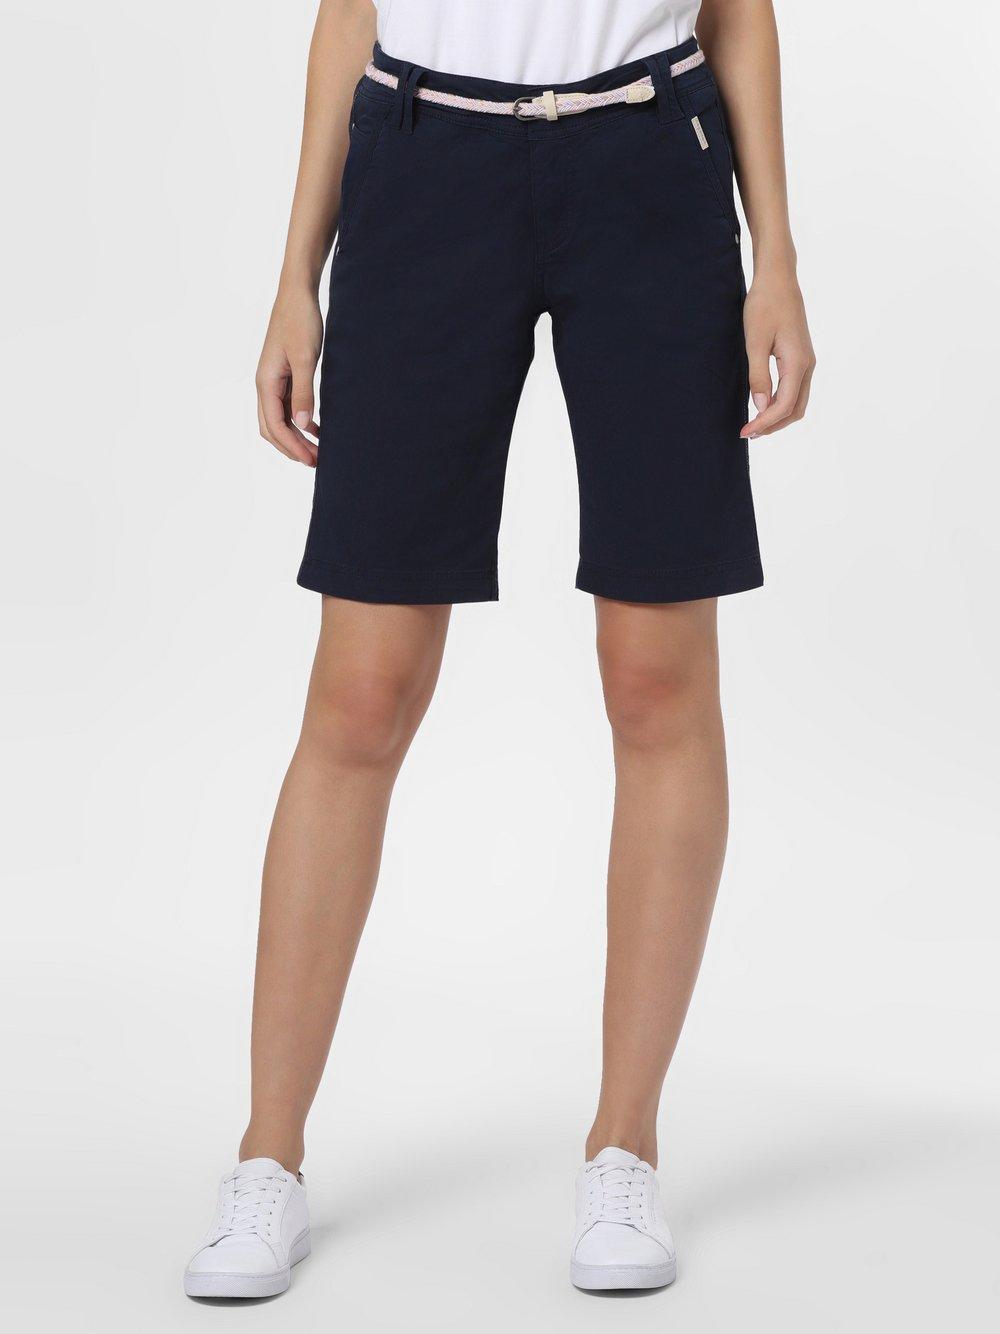 Ragwear – Spodenki damskie – Ramira, niebieski Van Graaf 467427-0001-09920